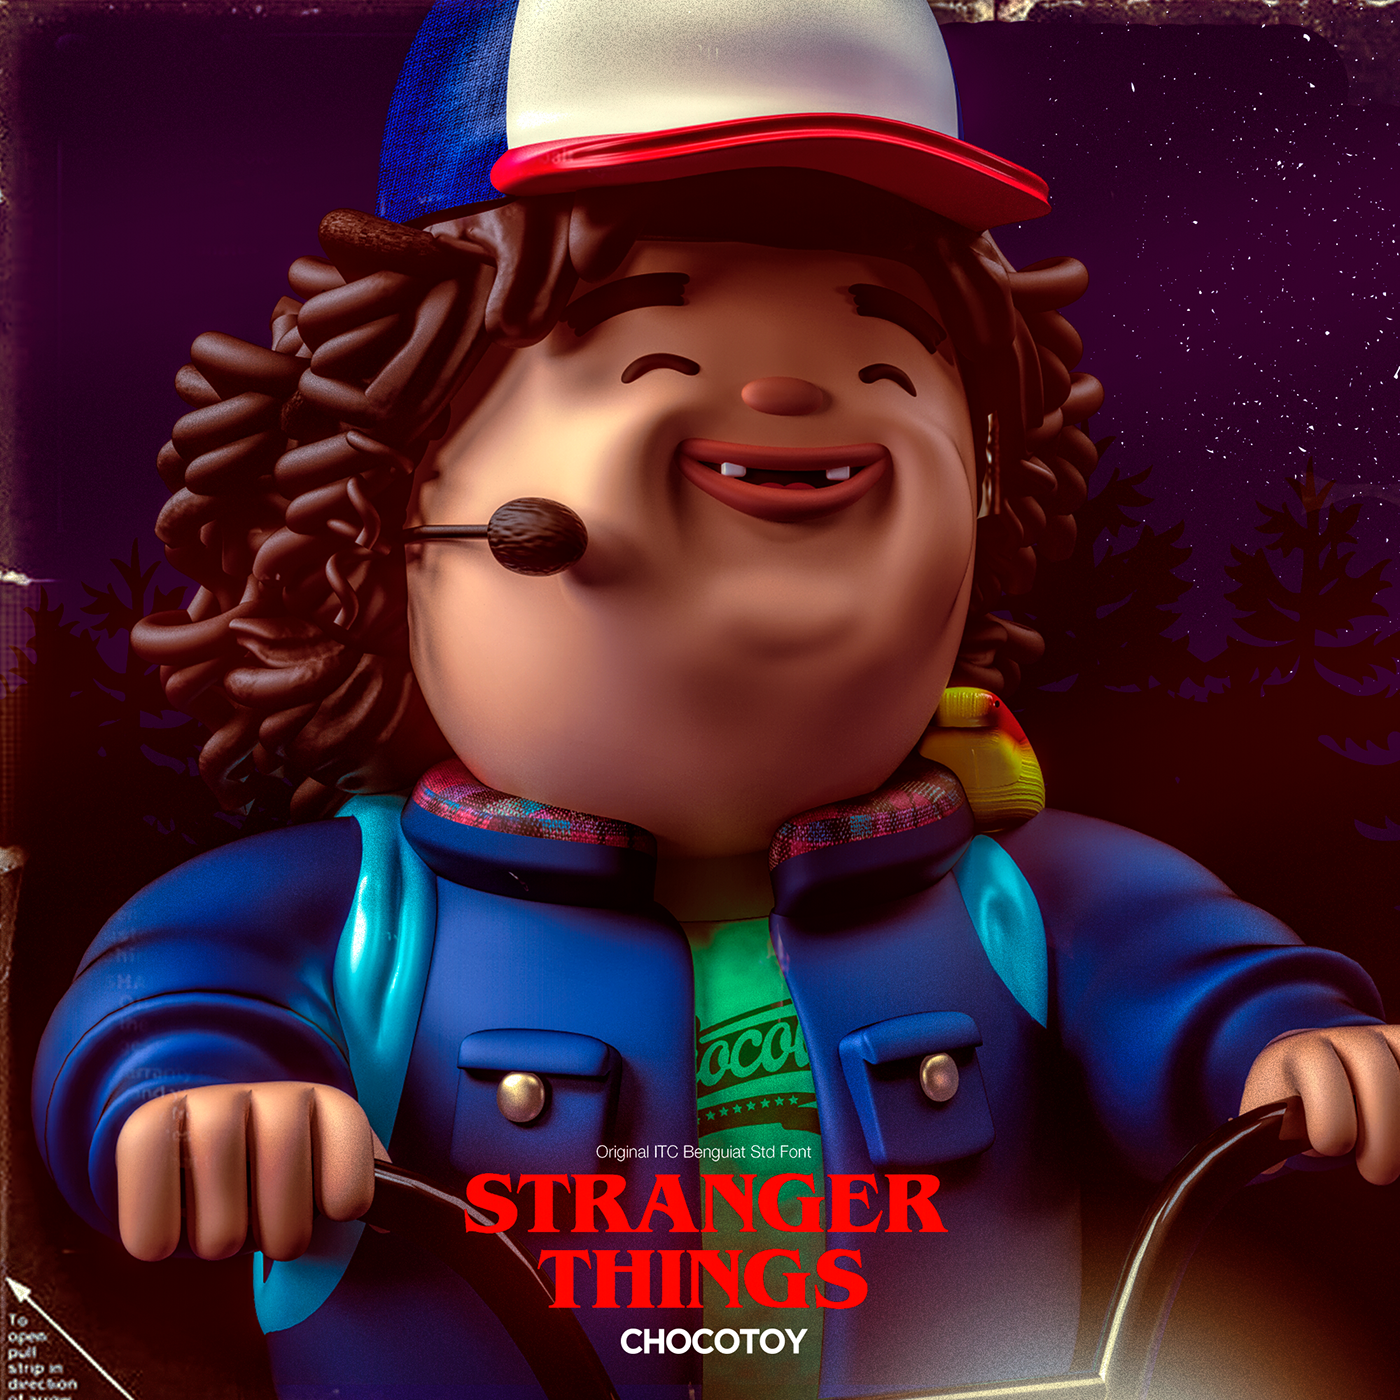 Stranger Things - chocotoy on Behance